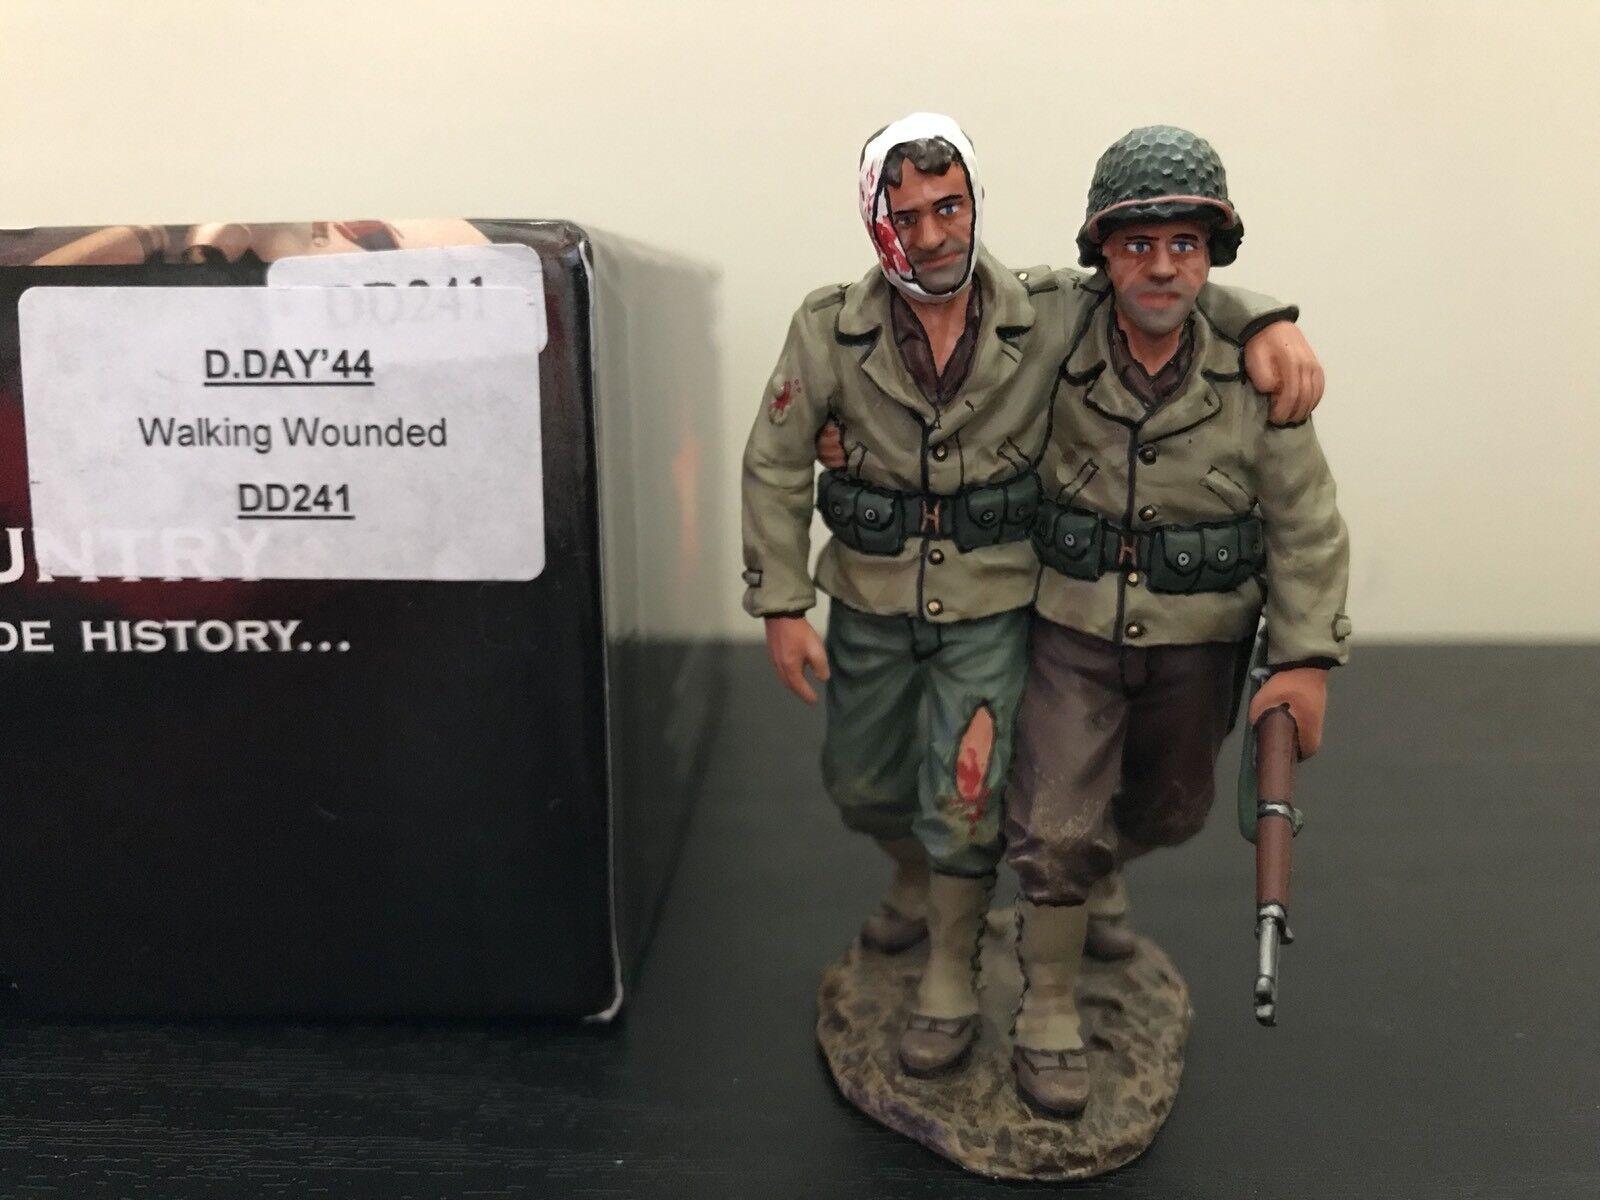 DD241 WW2 WW2 Walking Wounded US D-Day Normandy GI's Mint In Box DD 241